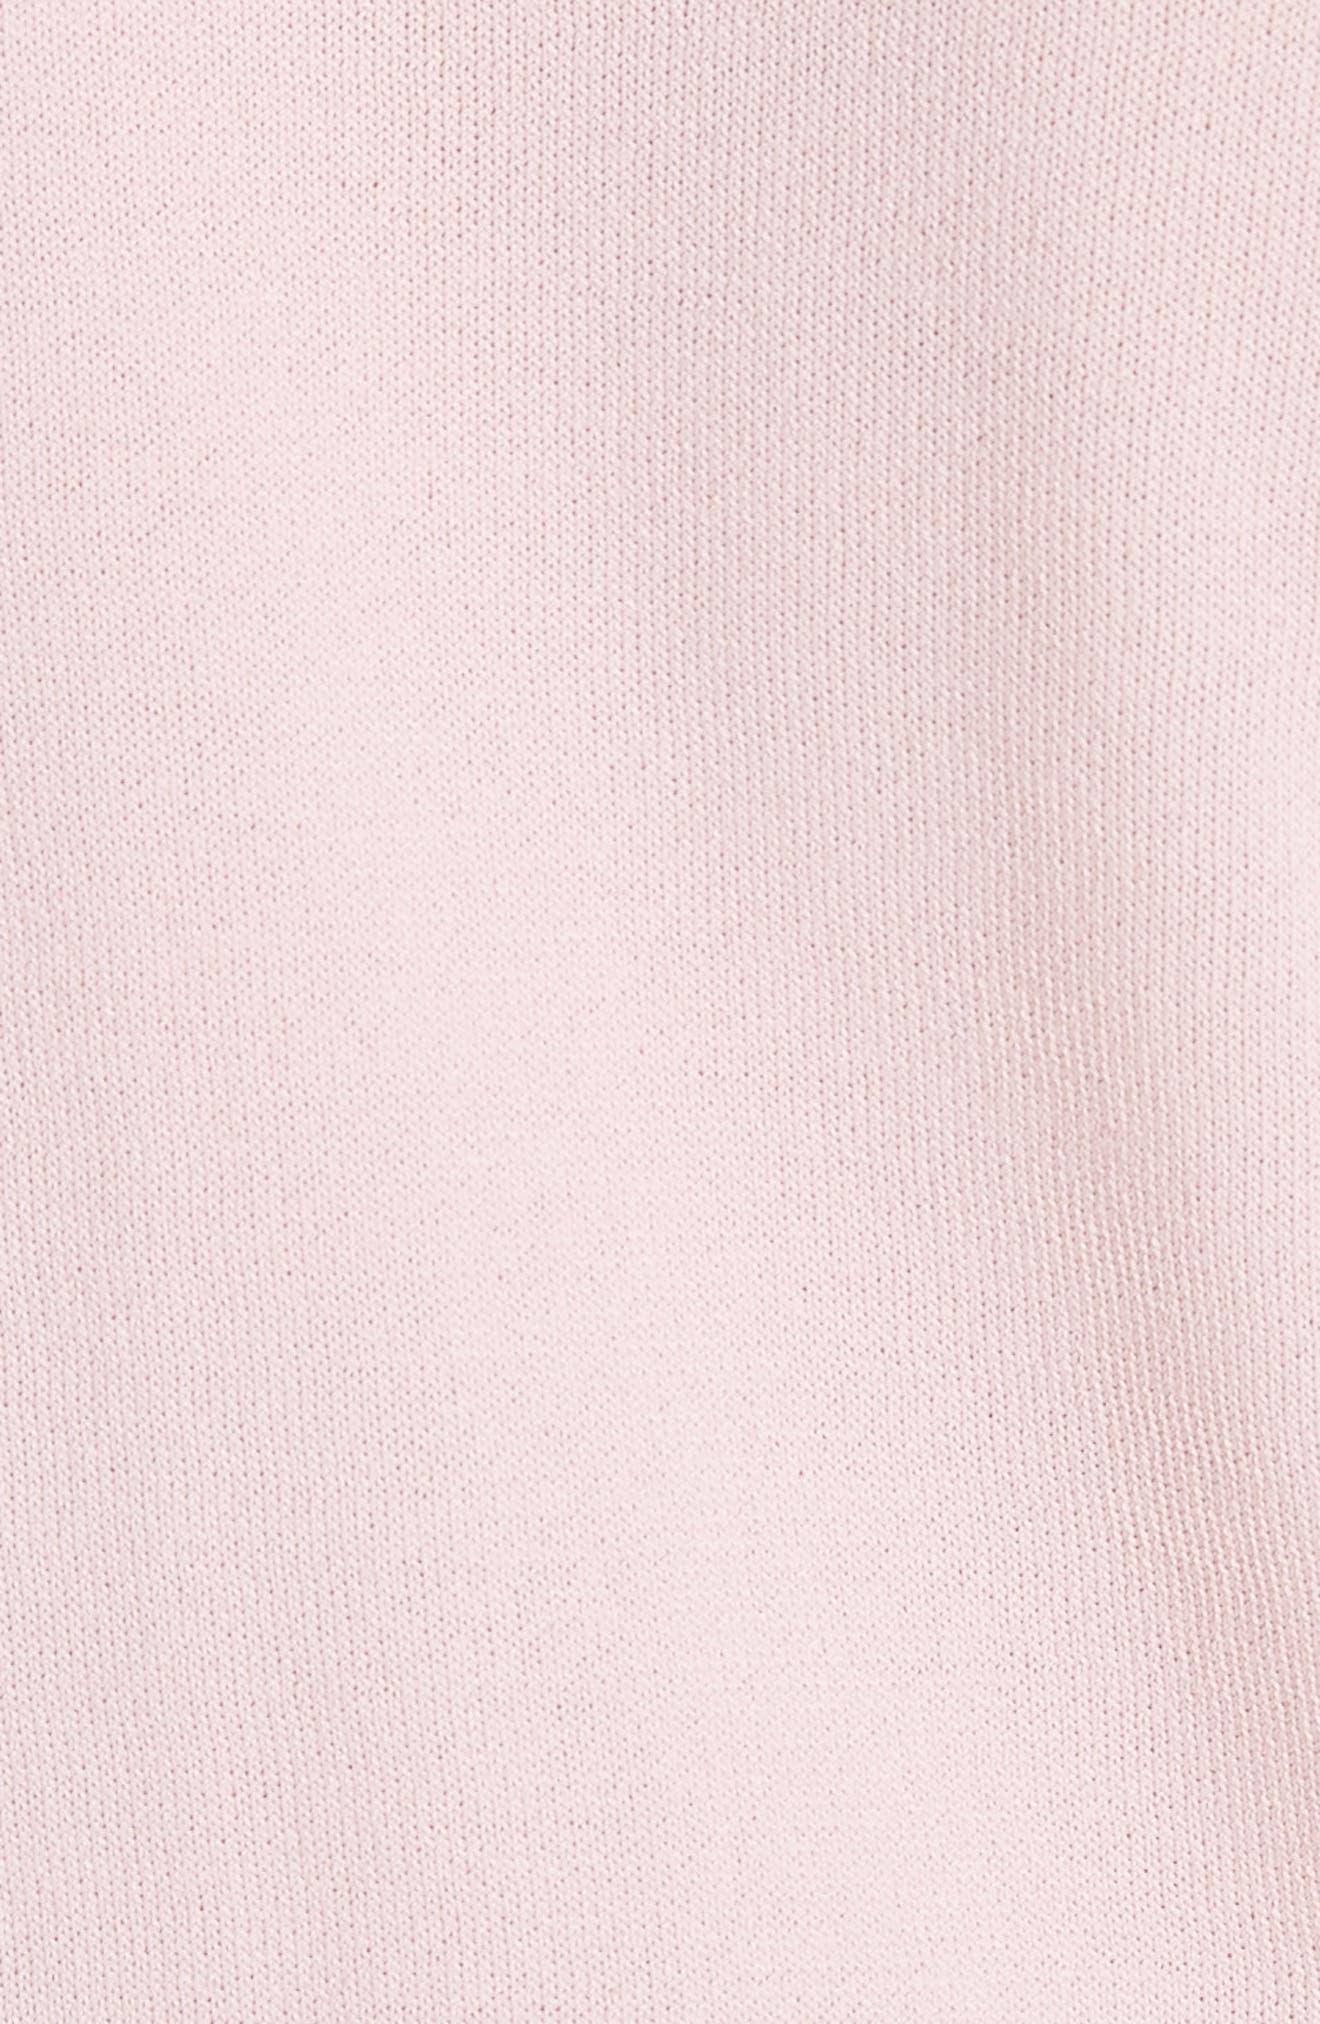 Satin Contrast Ruffle Sweater,                             Alternate thumbnail 5, color,                             Dusky Pink